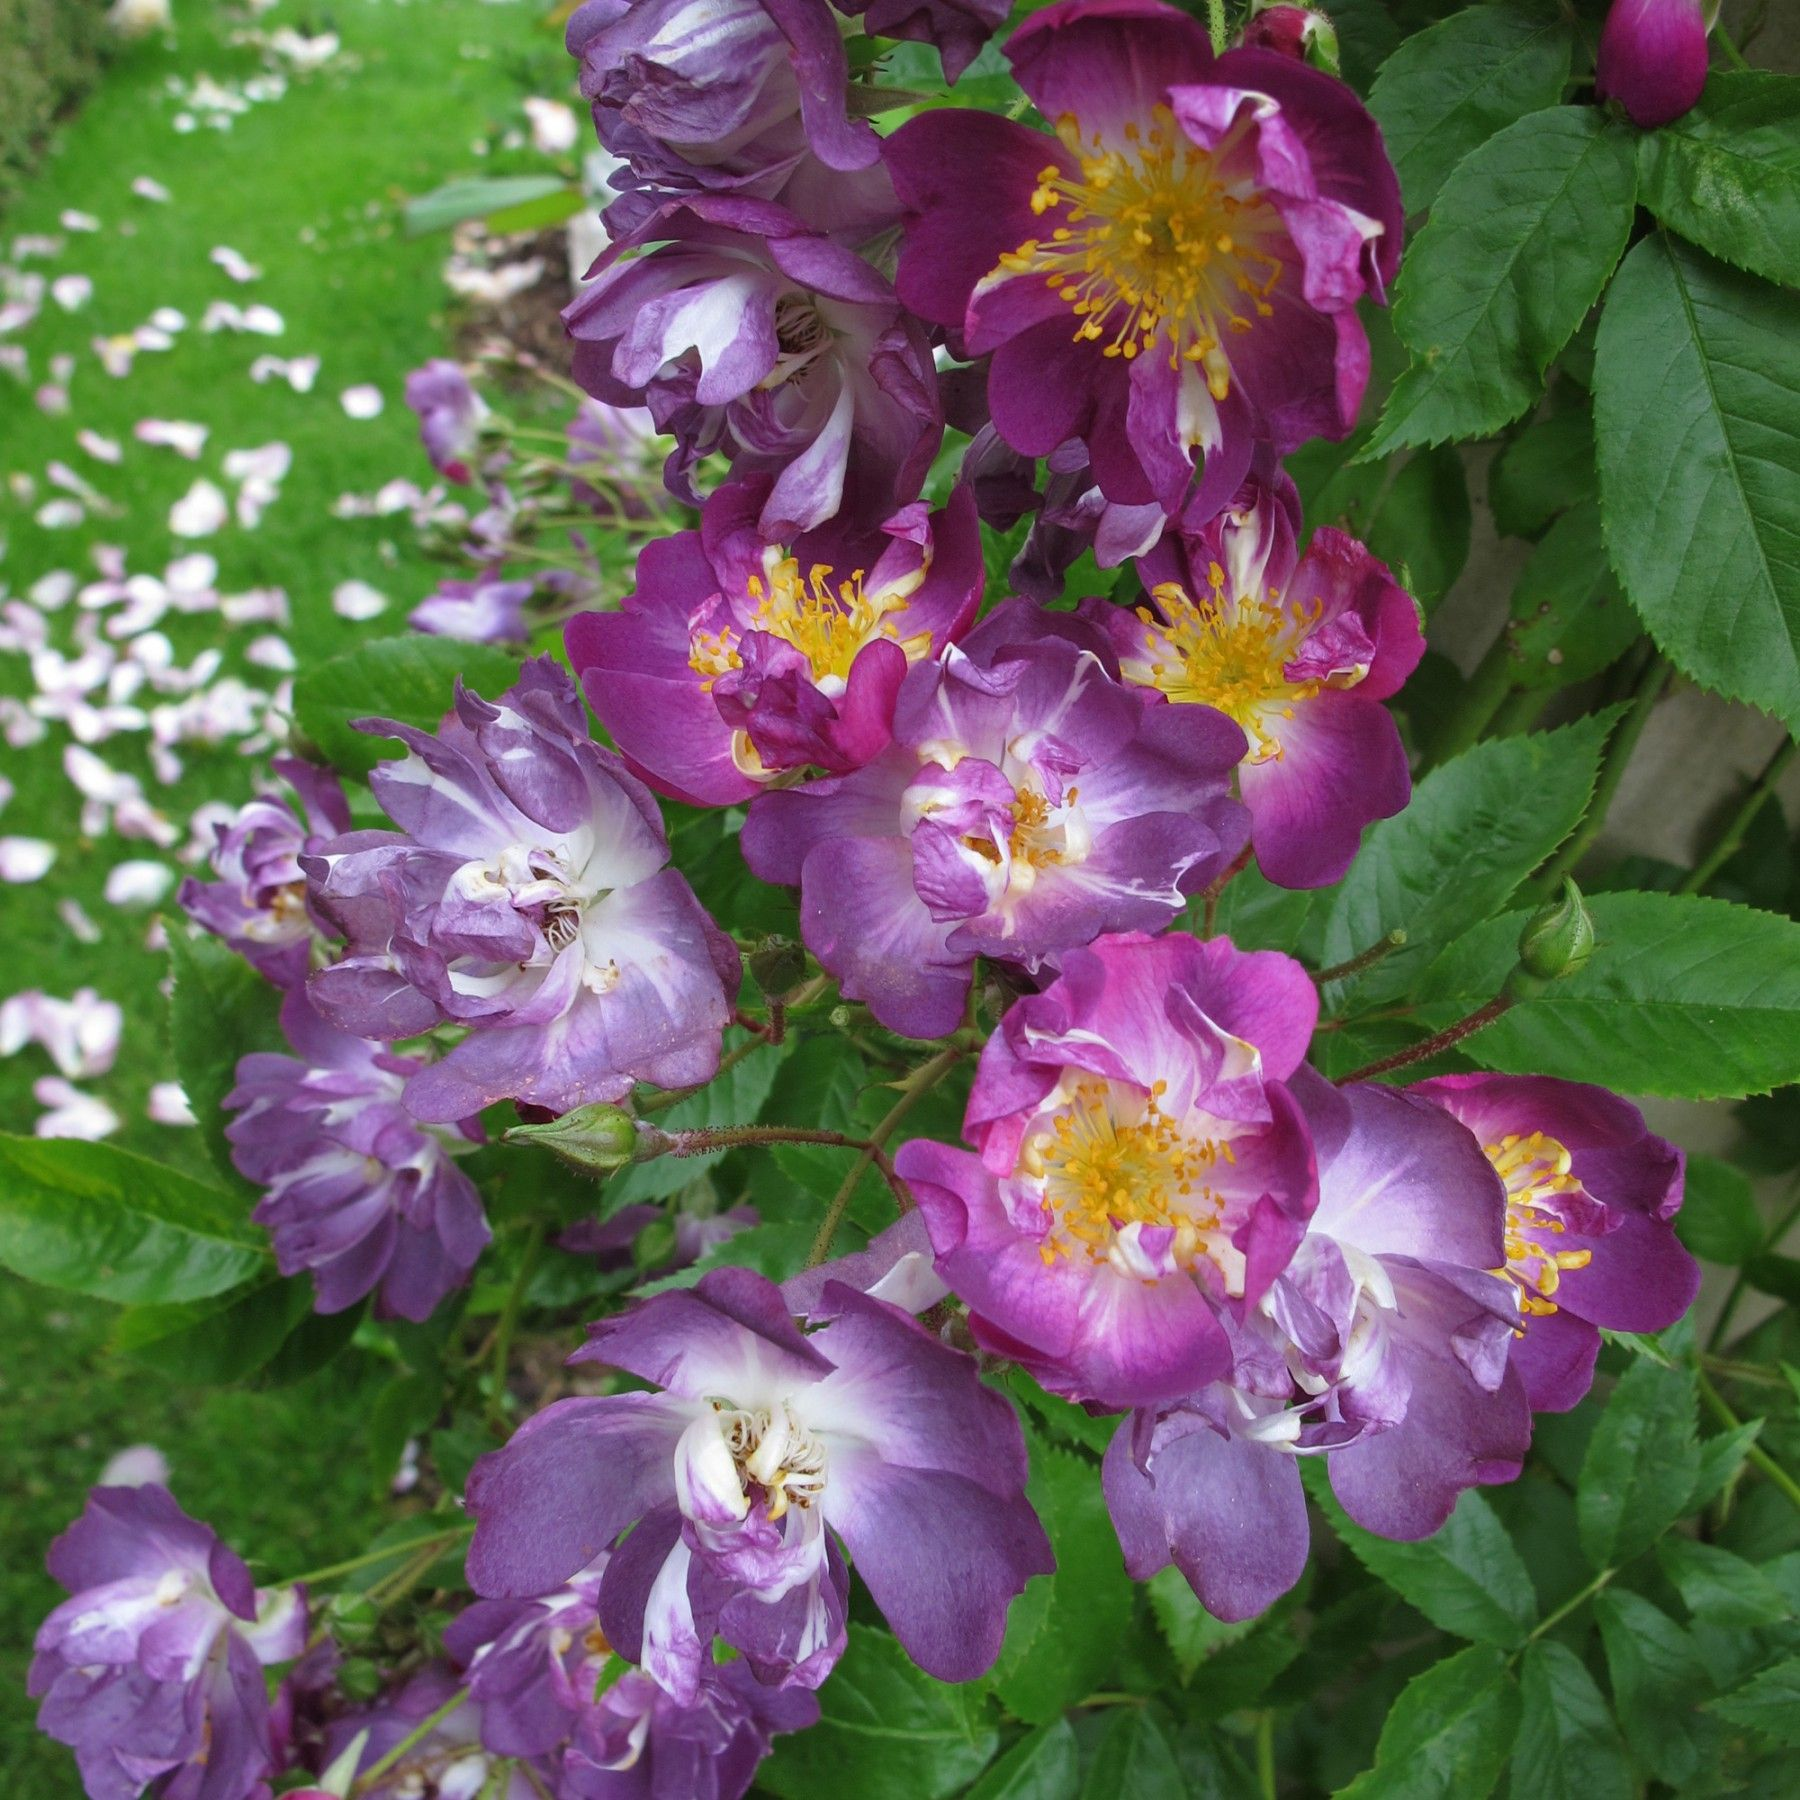 Types of Fragrant Climbing Plants